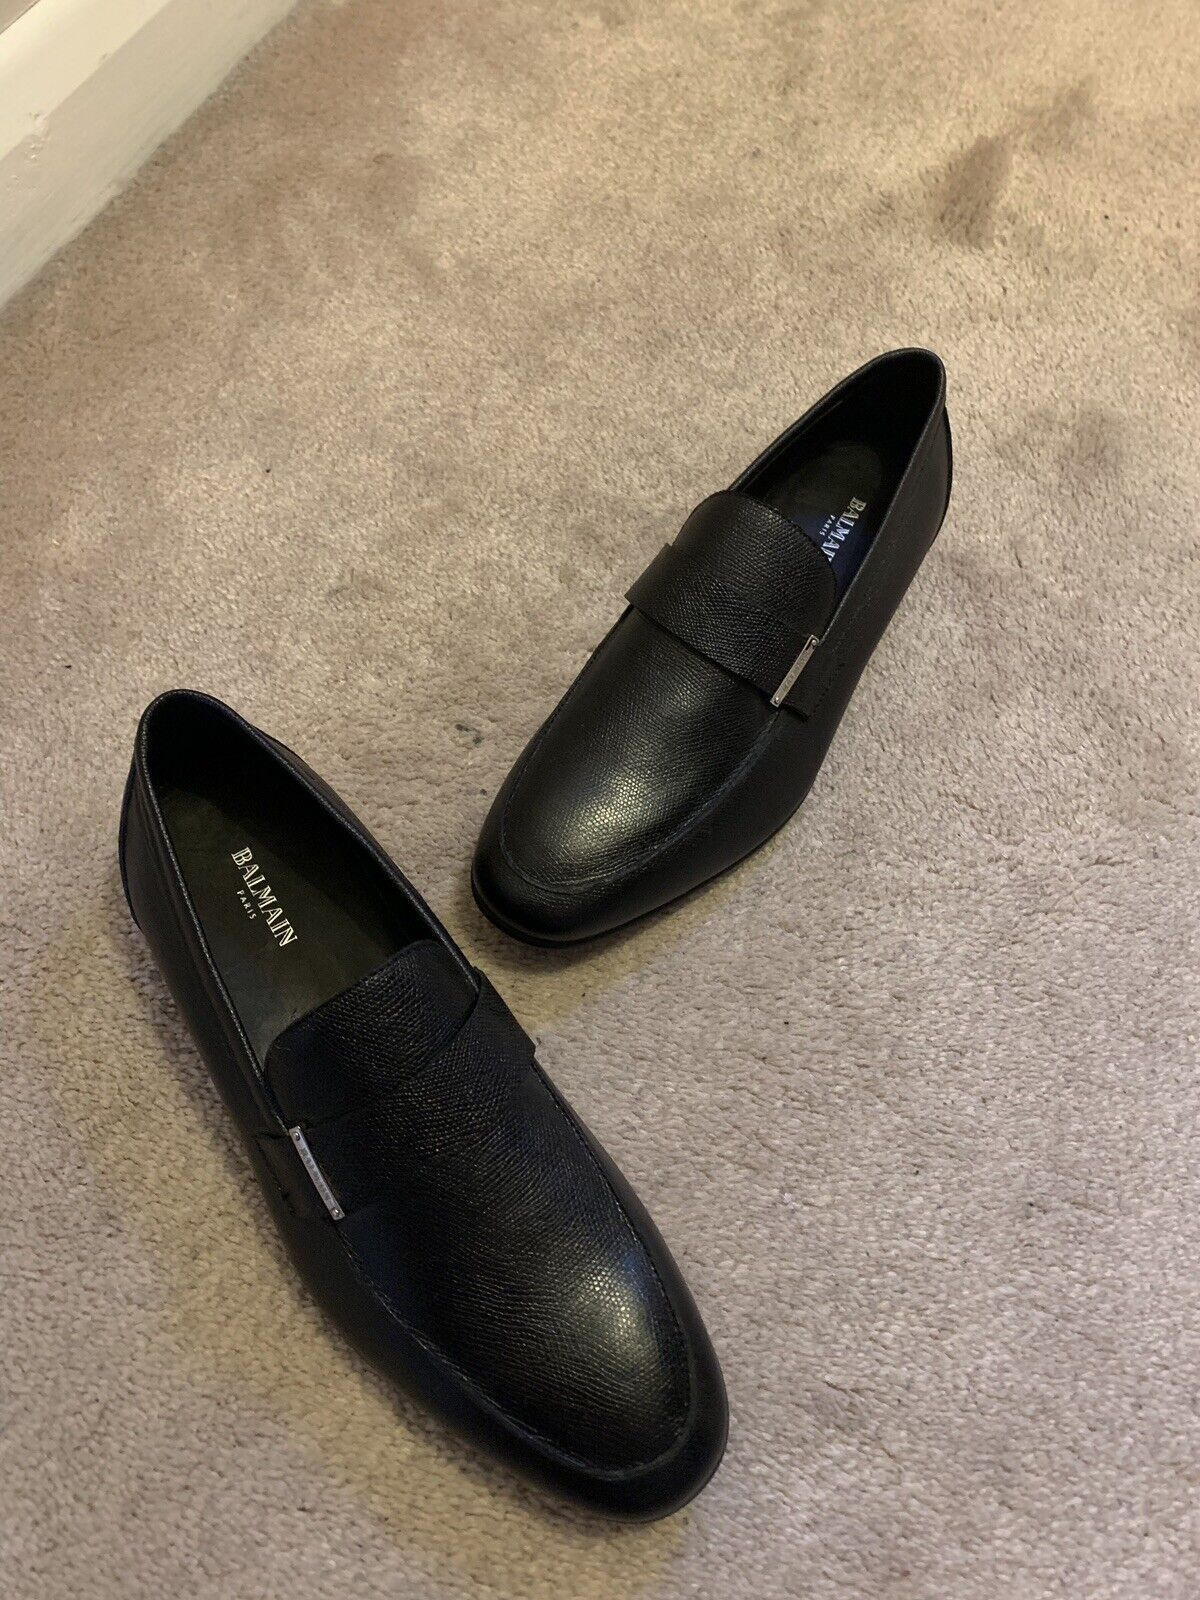 BALMAIN Hommes Loisirs Chaussures Slip Ons Chaussures Taille 41 Rare 100% Véritable